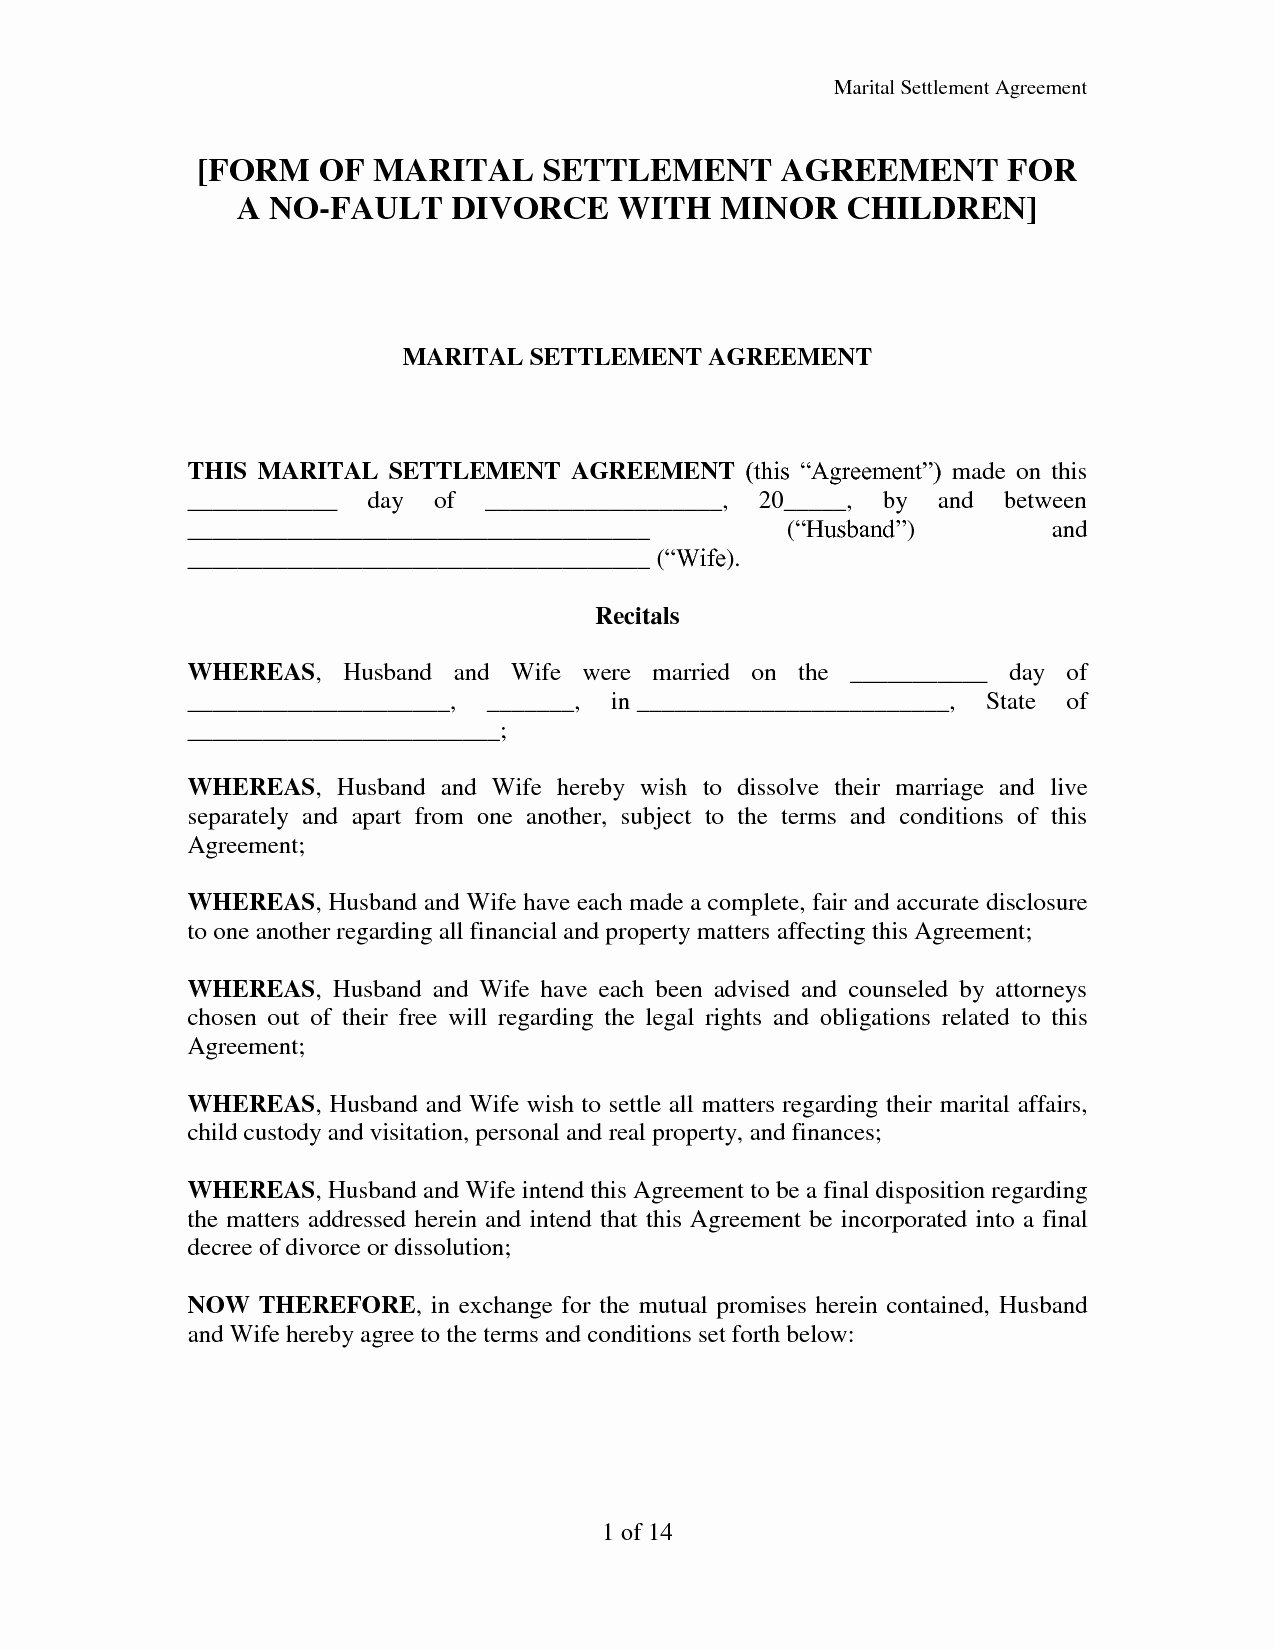 Marriage Settlement Agreement Template Elegant Divorce Settlement Agreement Template Image Collections